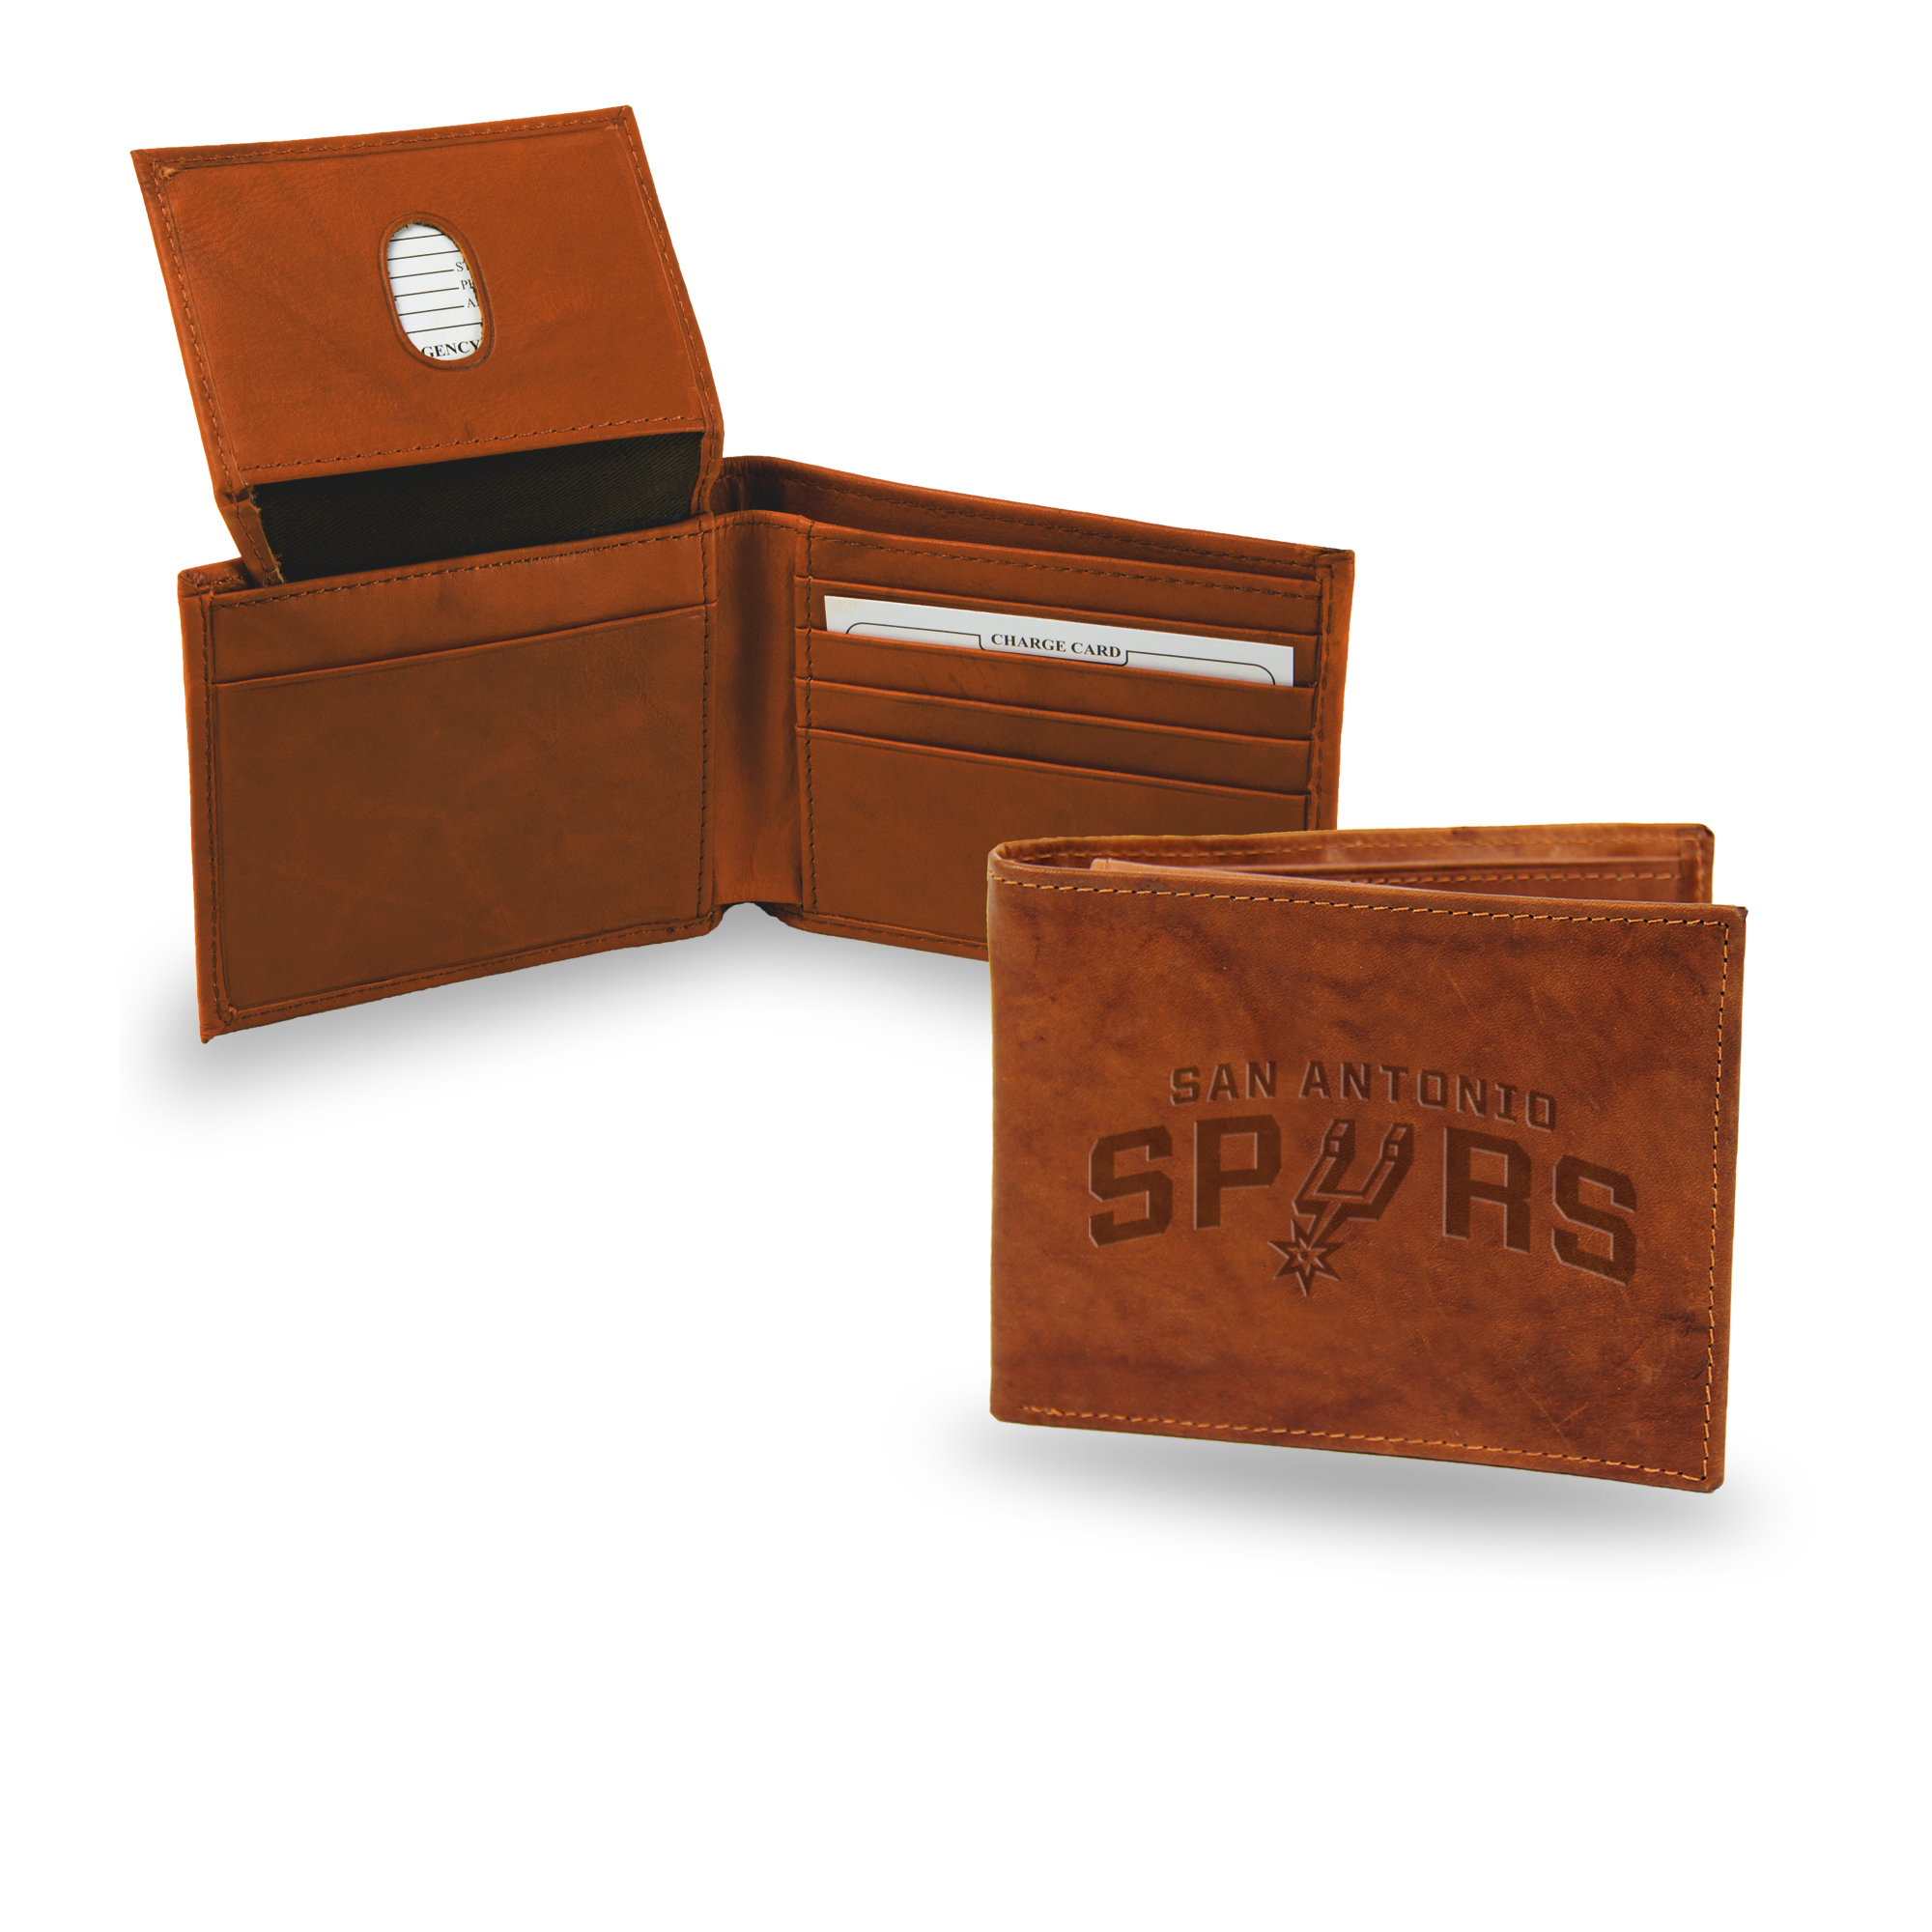 San Antonio Spurs NBA Embossed Team Logo Brown Leather Billfold Wallet